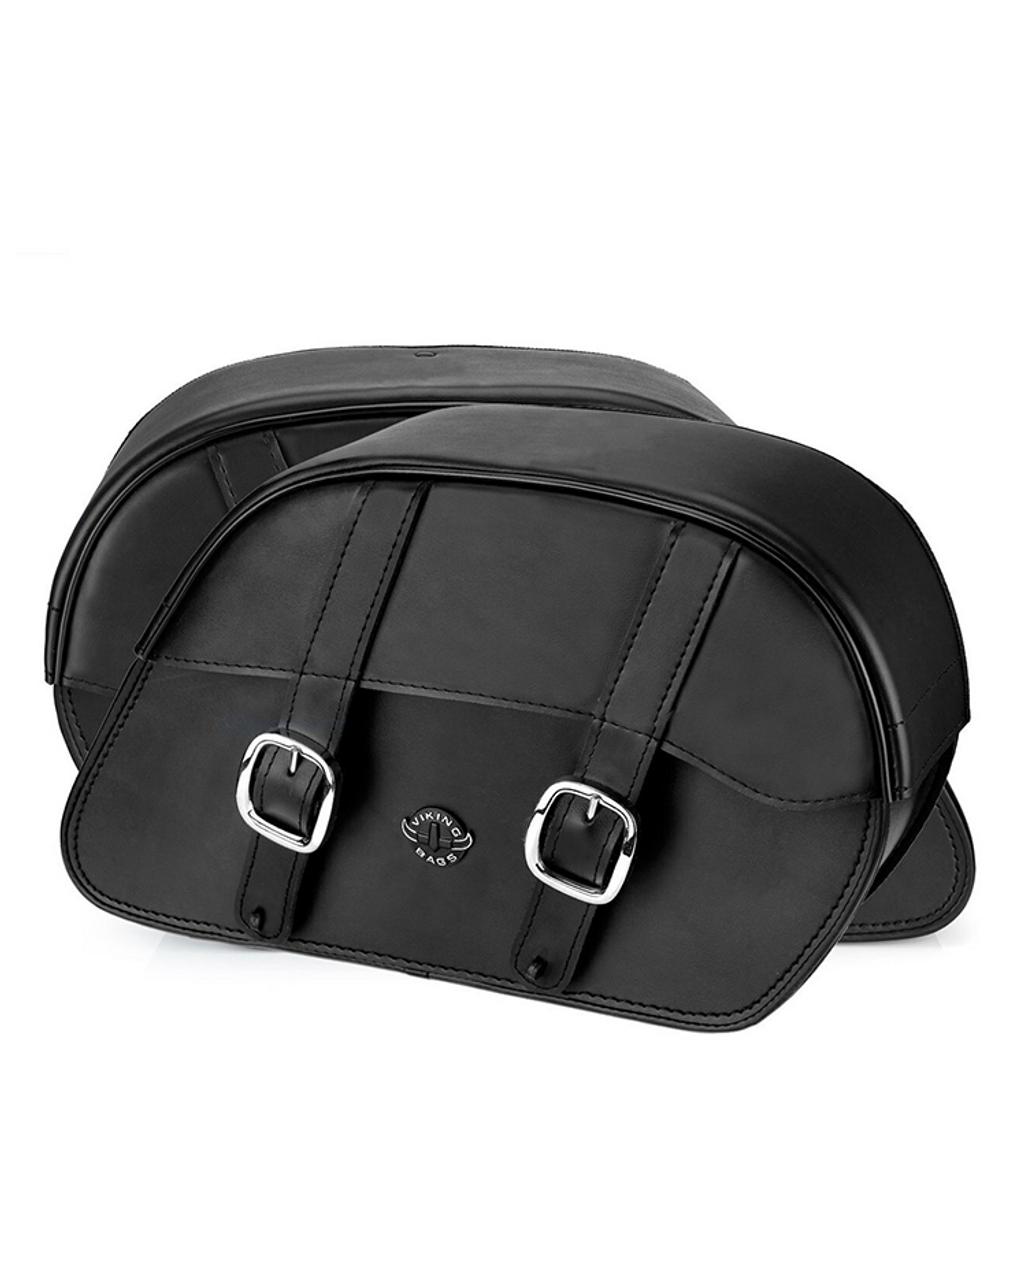 Viking Slant Medium Motorcycle Saddlebags For Harley Softail Springer FXSTS both bags view